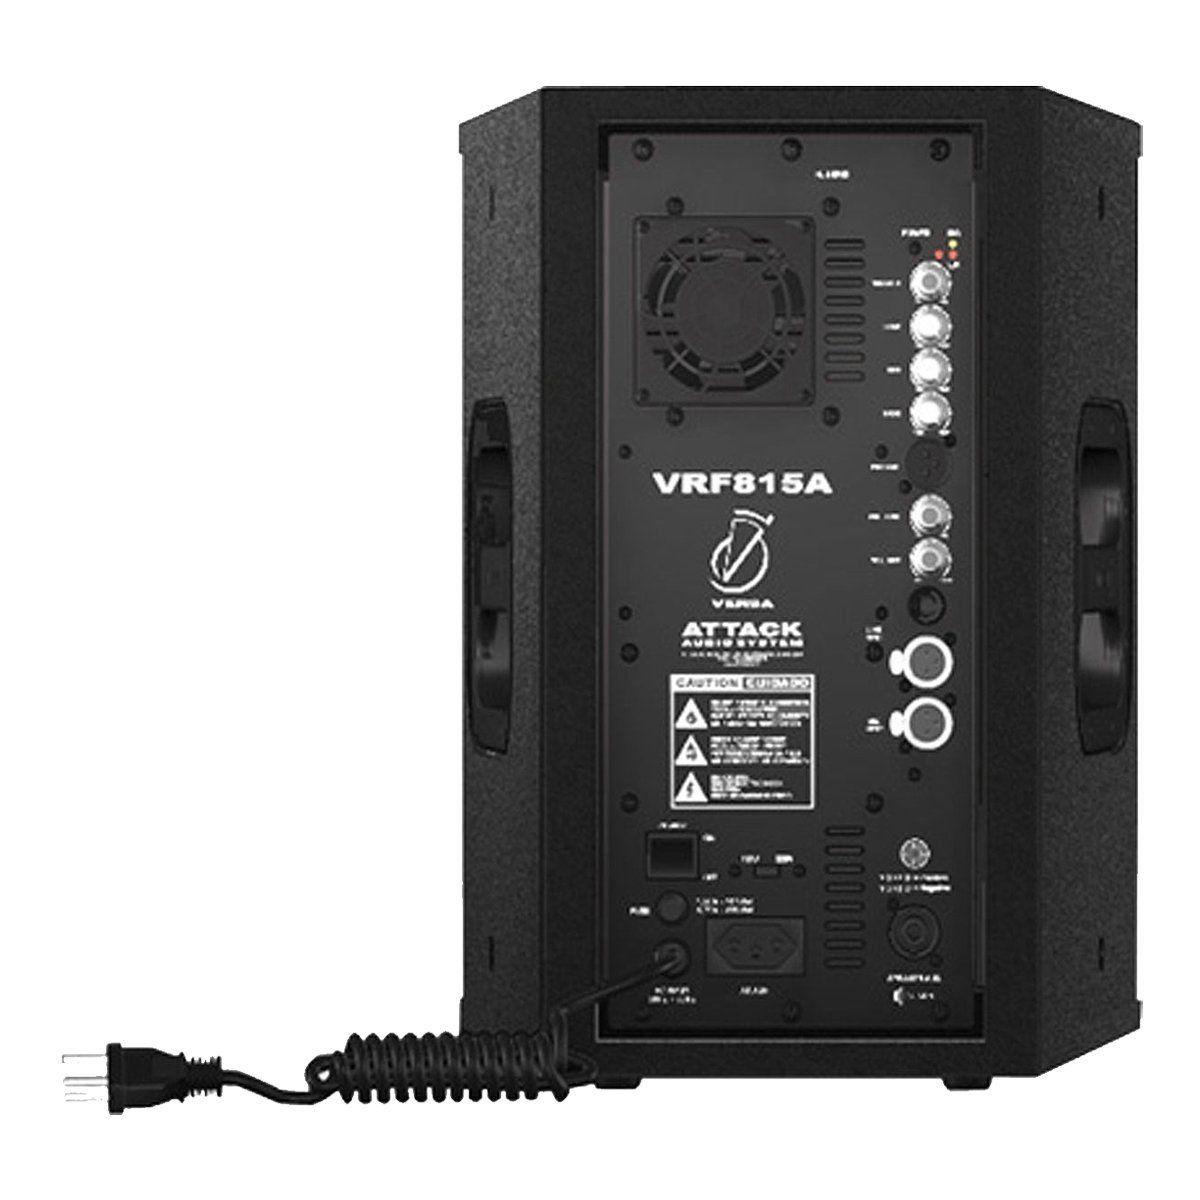 Caixa Ativa Fal 8 Pol 150W VRF 815 A - Attack